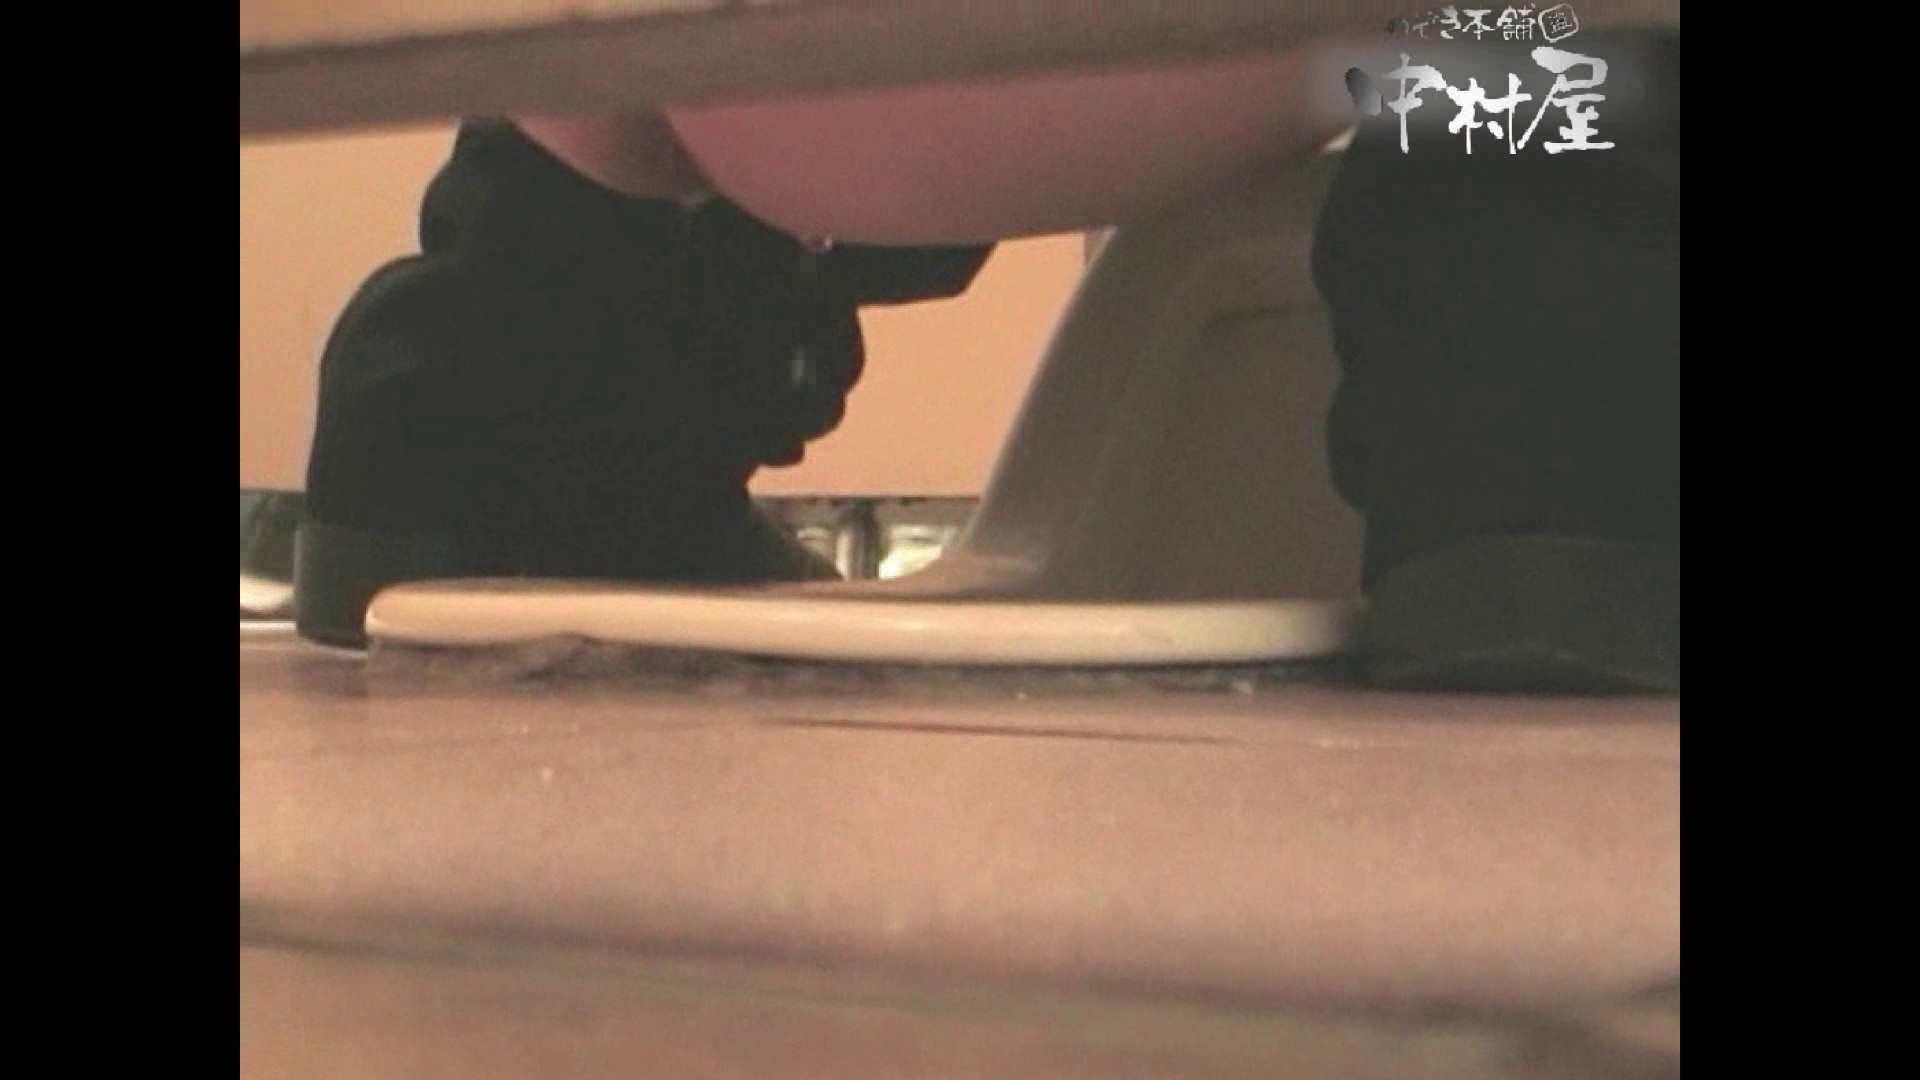 岩手県在住盗撮師盗撮記録vol.03 マンコ無修正 盗撮セックス無修正動画無料 99画像 18